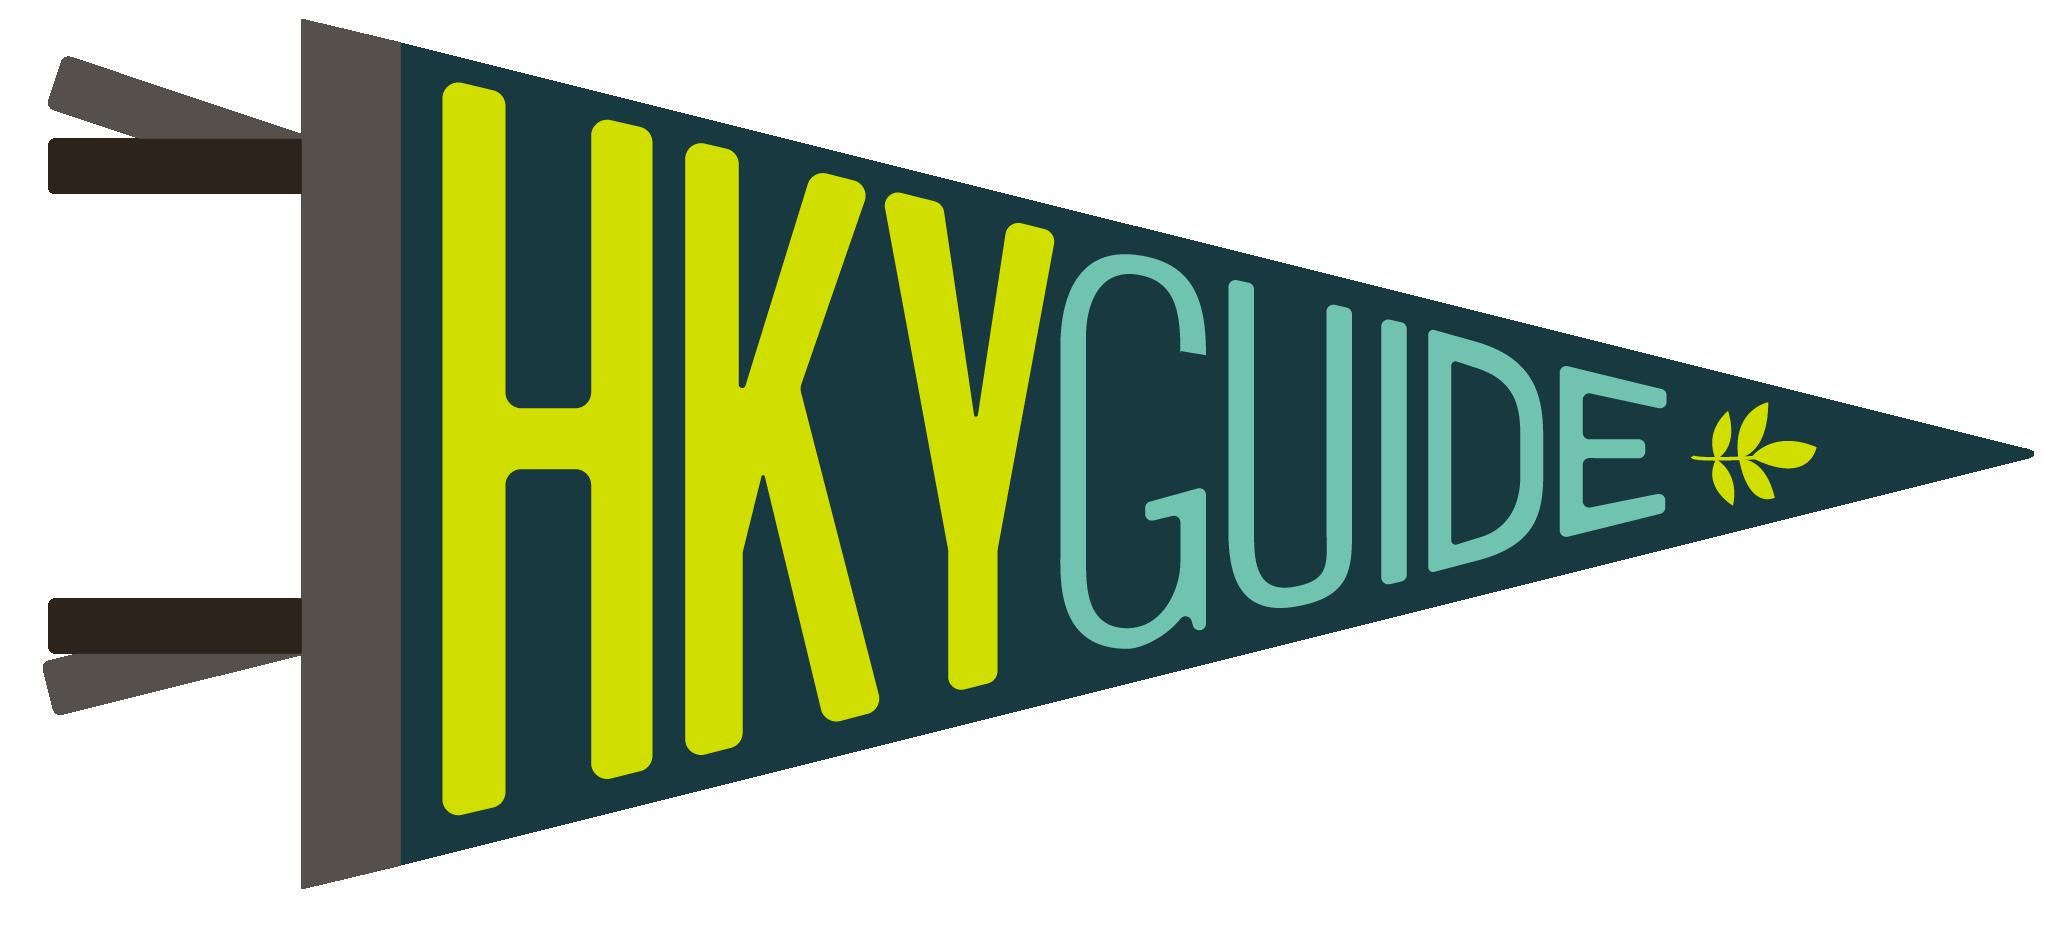 hky_logo-06.png